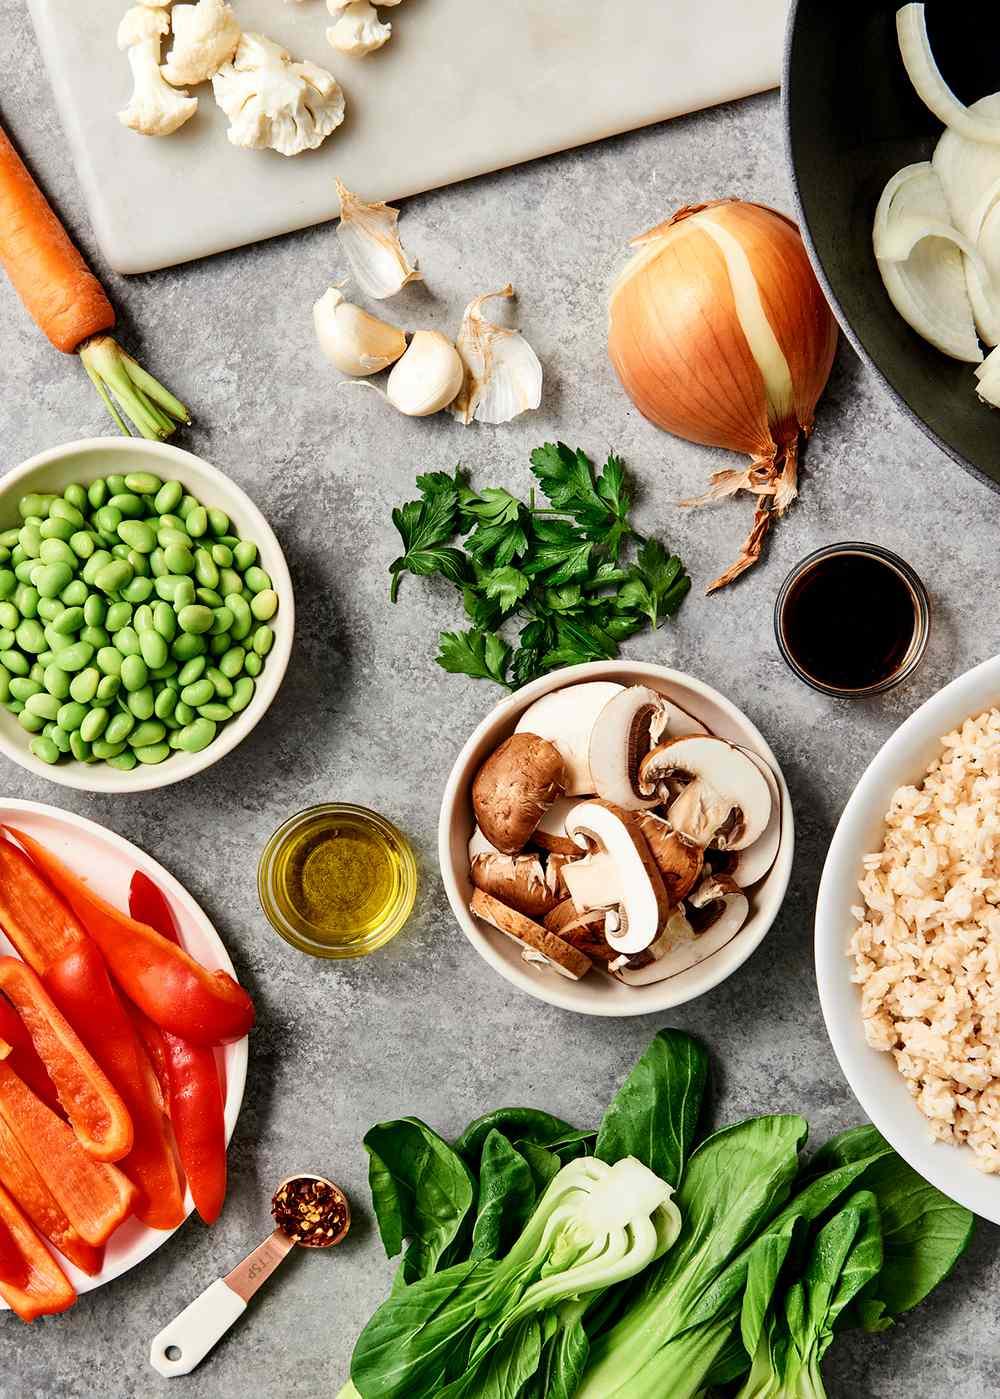 mushroom veggies prep for stir fry